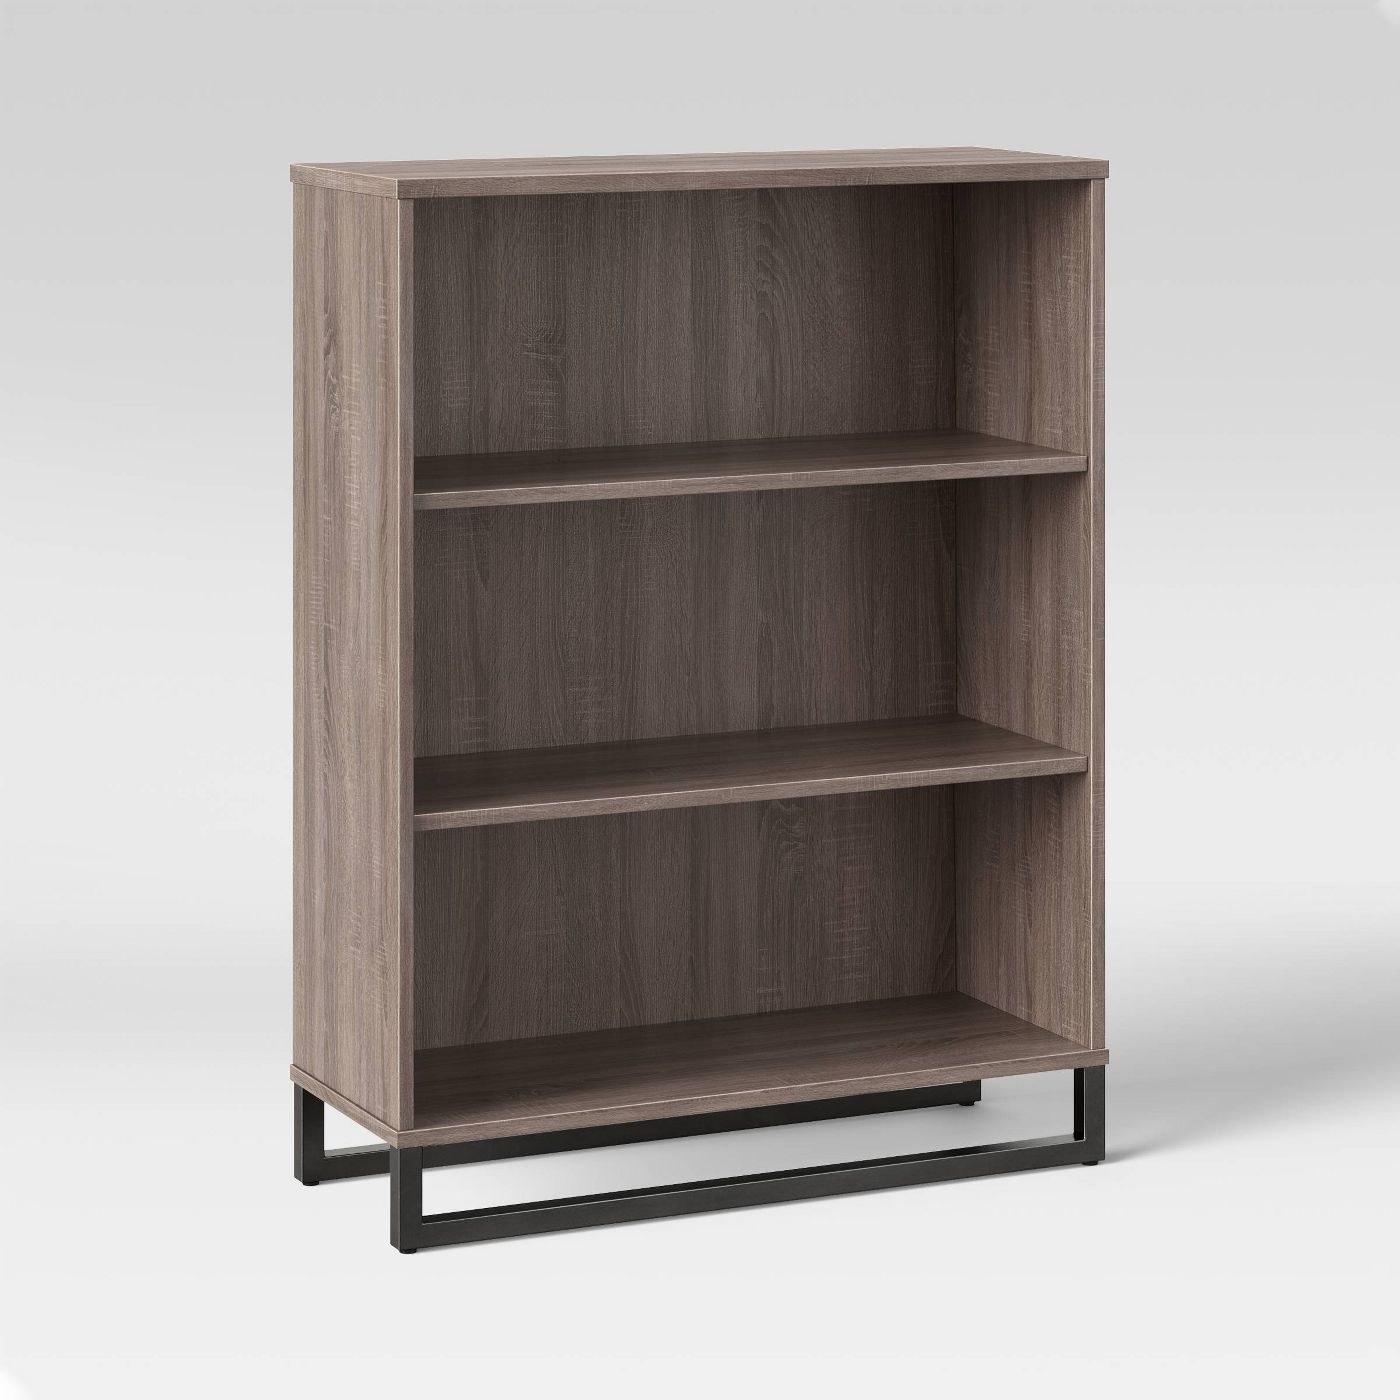 the gray bookshelf with black legs